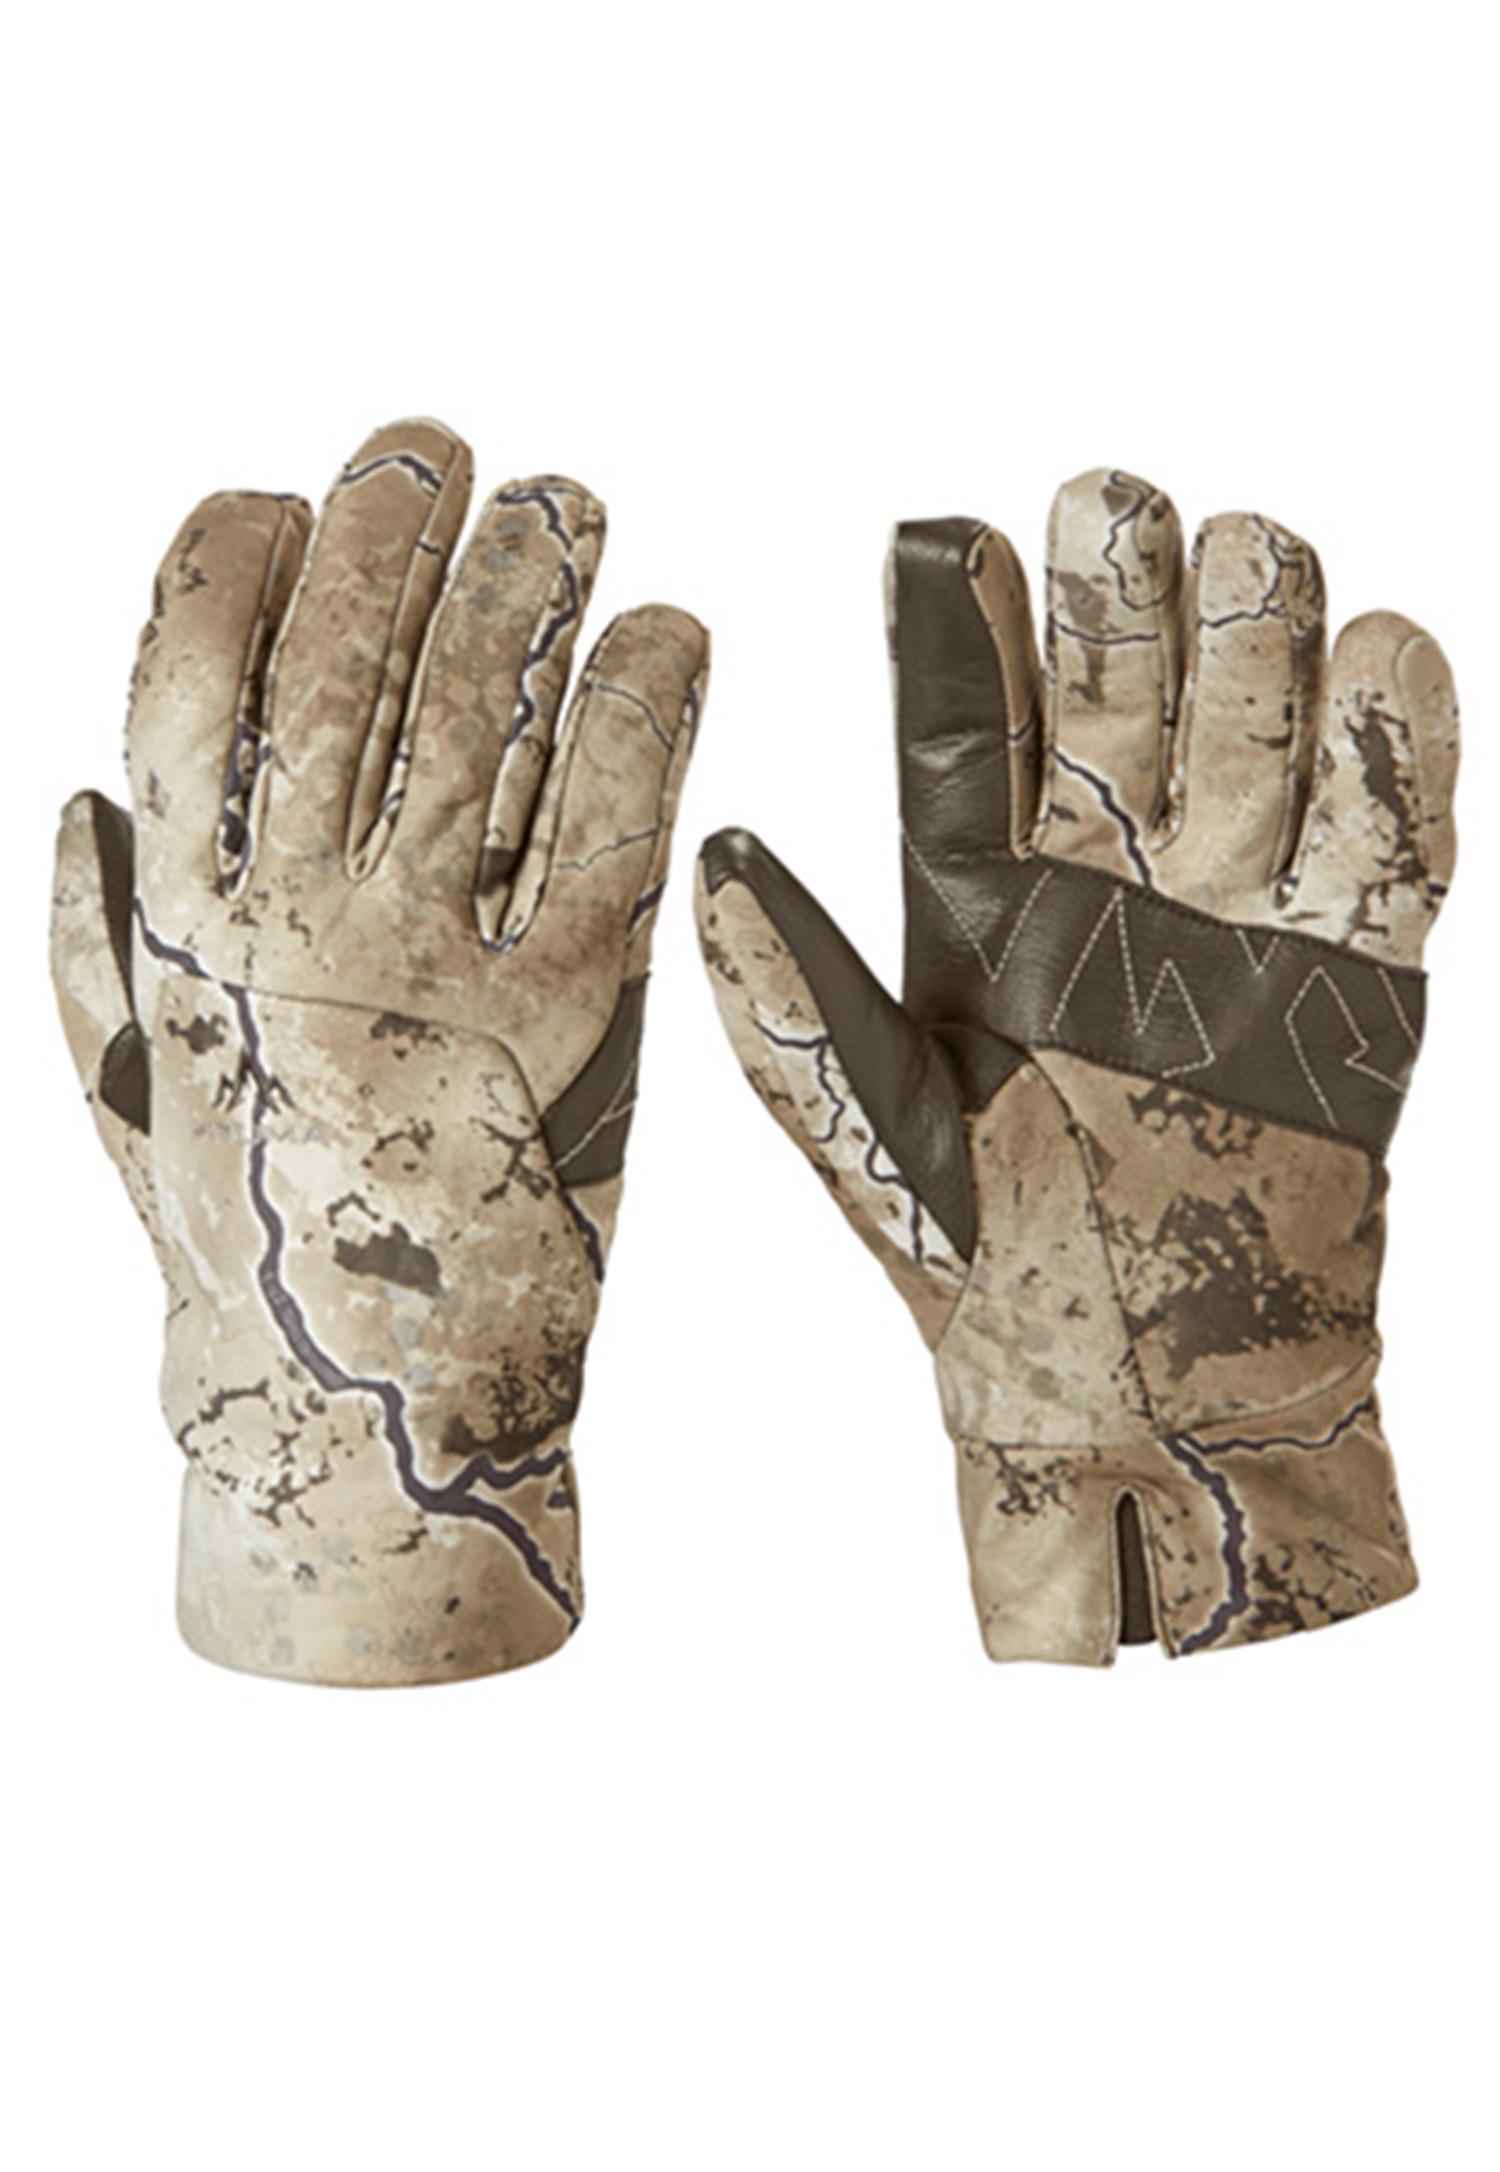 Waypoint Glove - Hunting